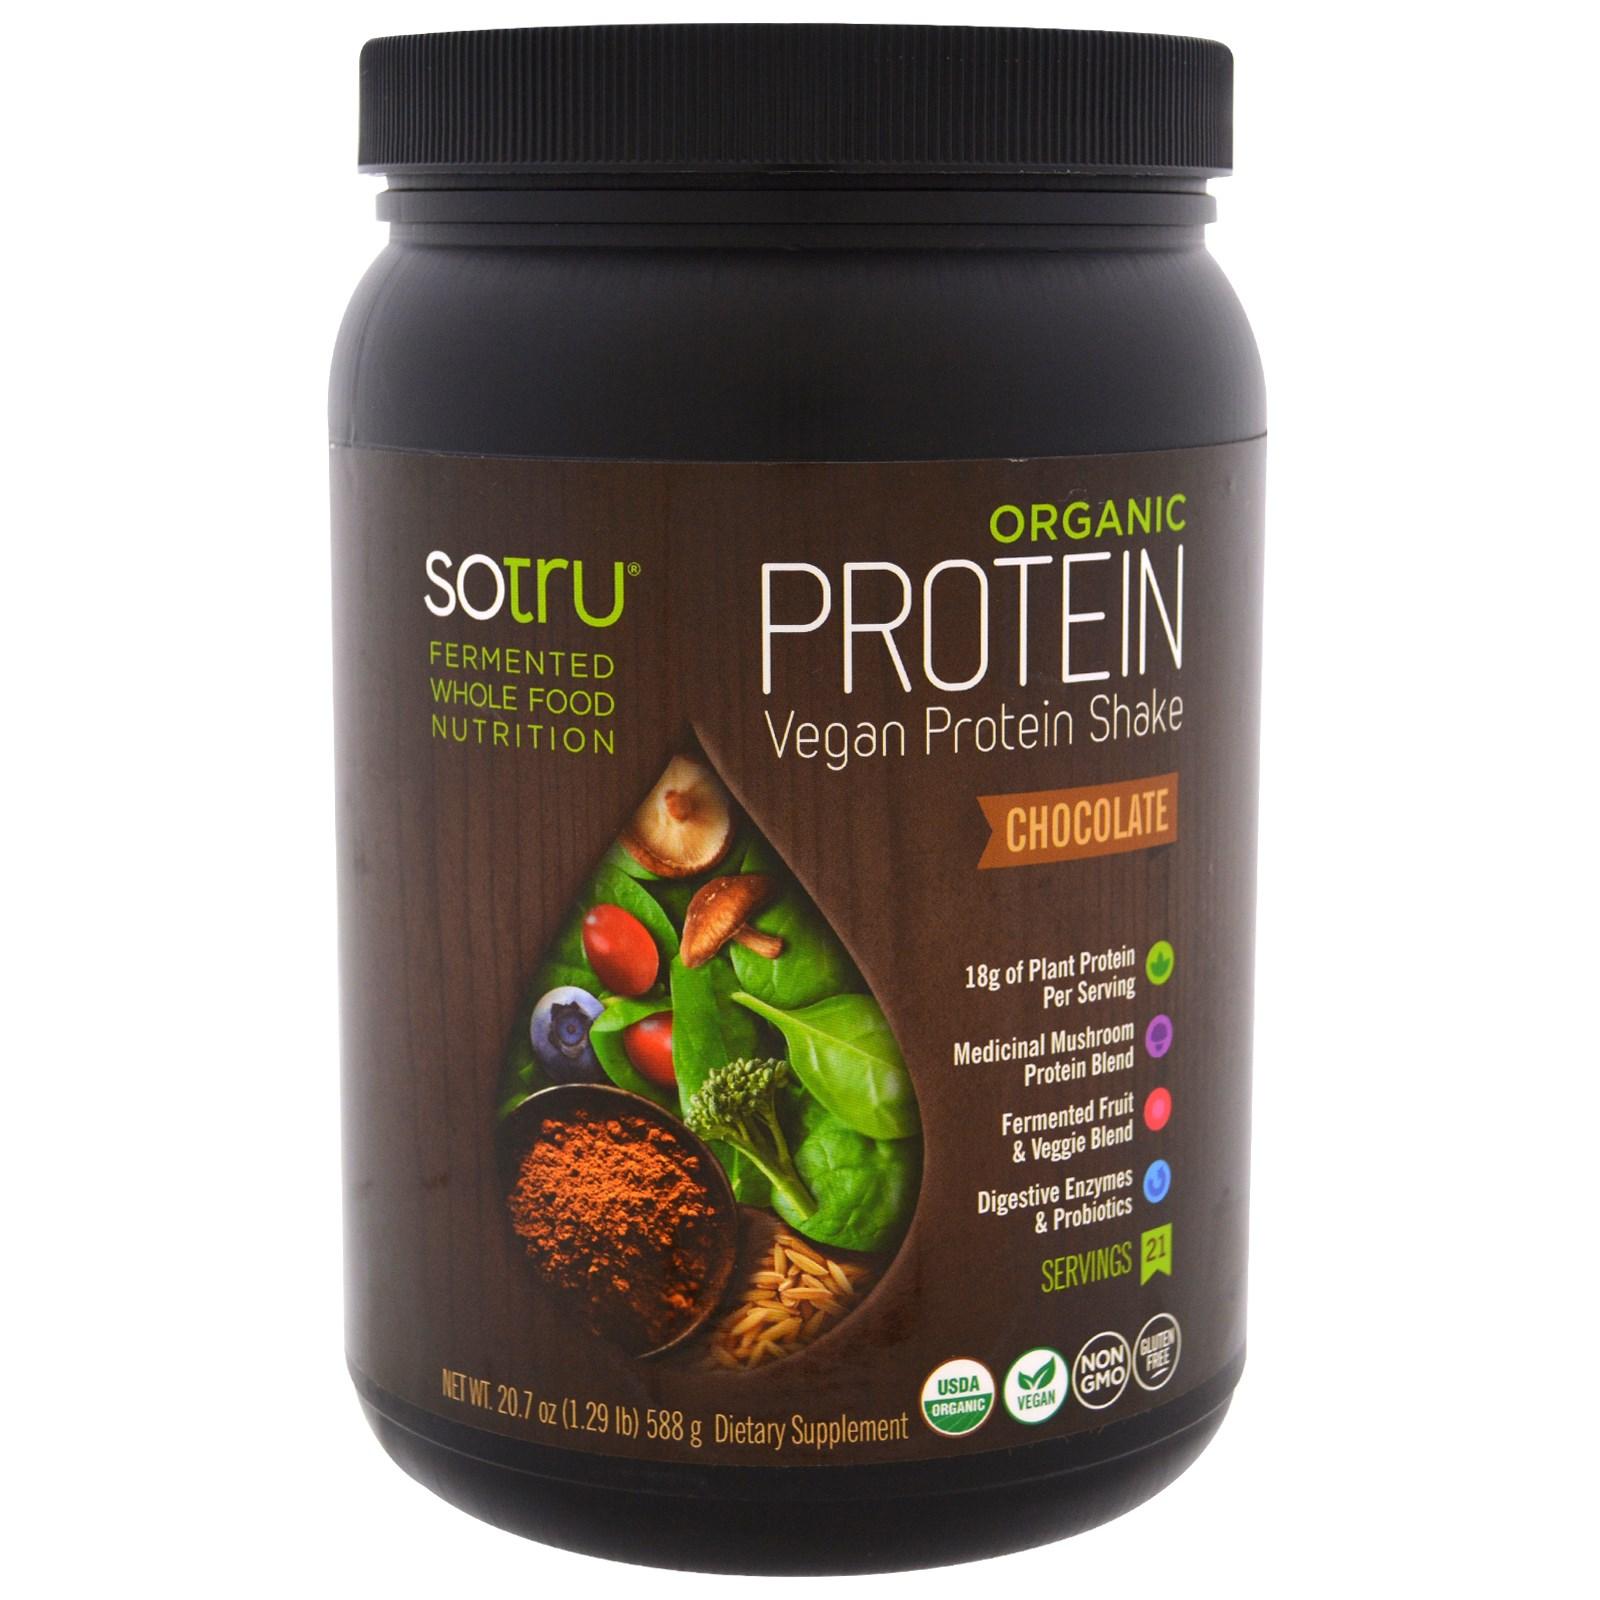 SoTru, Organic Vegan Protein Shake, Chocolate, 20.7 oz (588 g ...